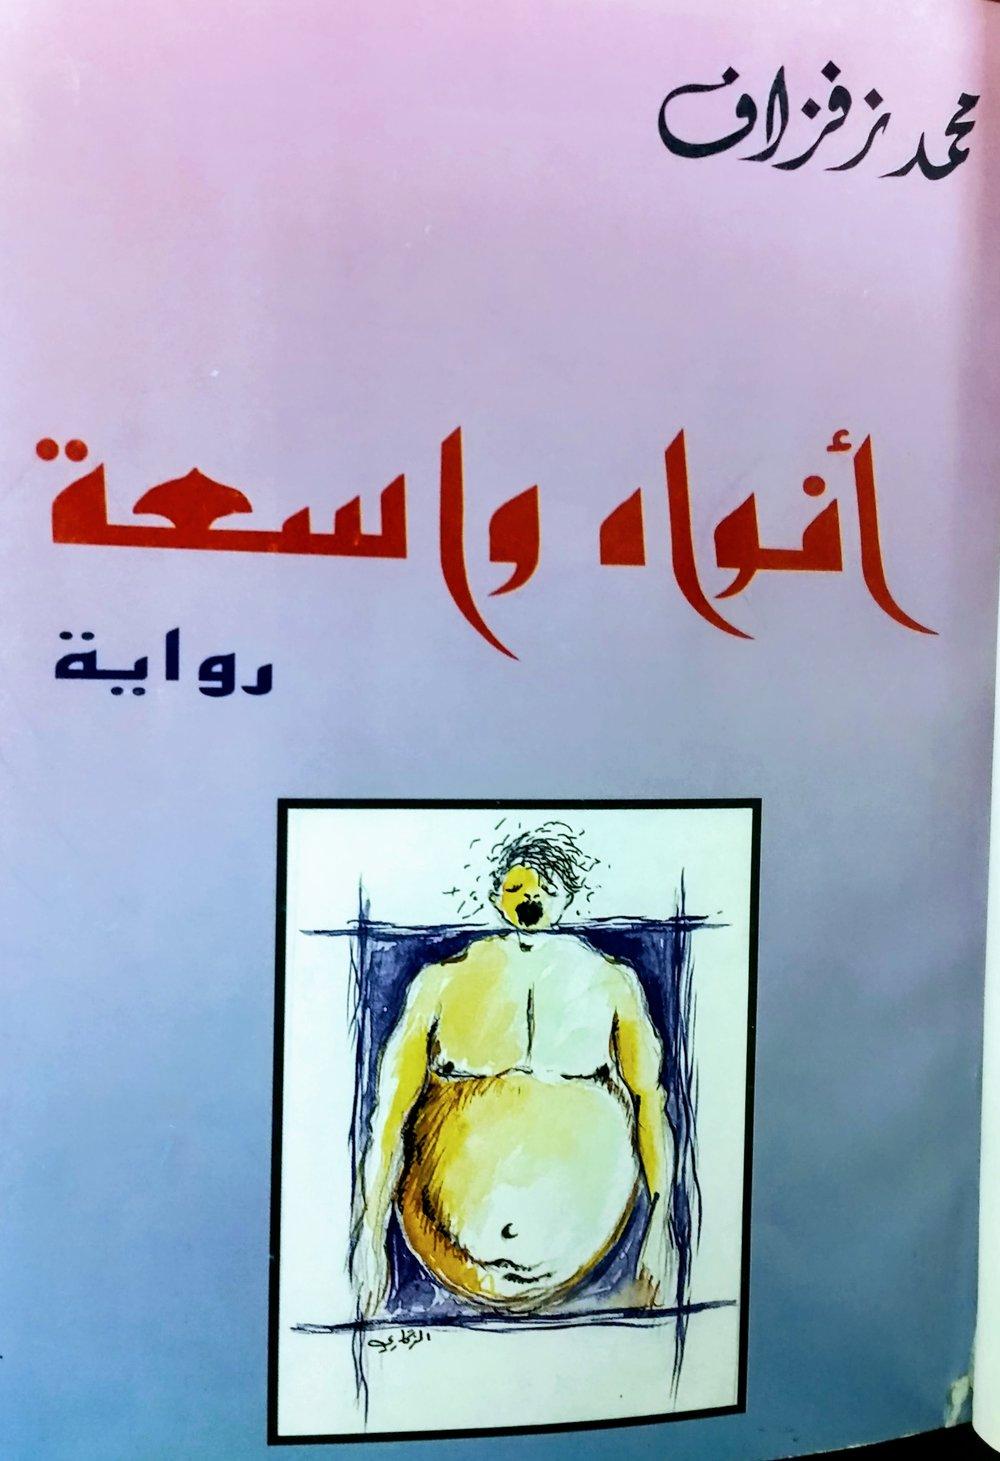 Muḥammad Zafzāf, Afwāh wāsiʾah (Dār al-Bayḍāʿ: Maṭbaʾat al-Janūb, 1998)